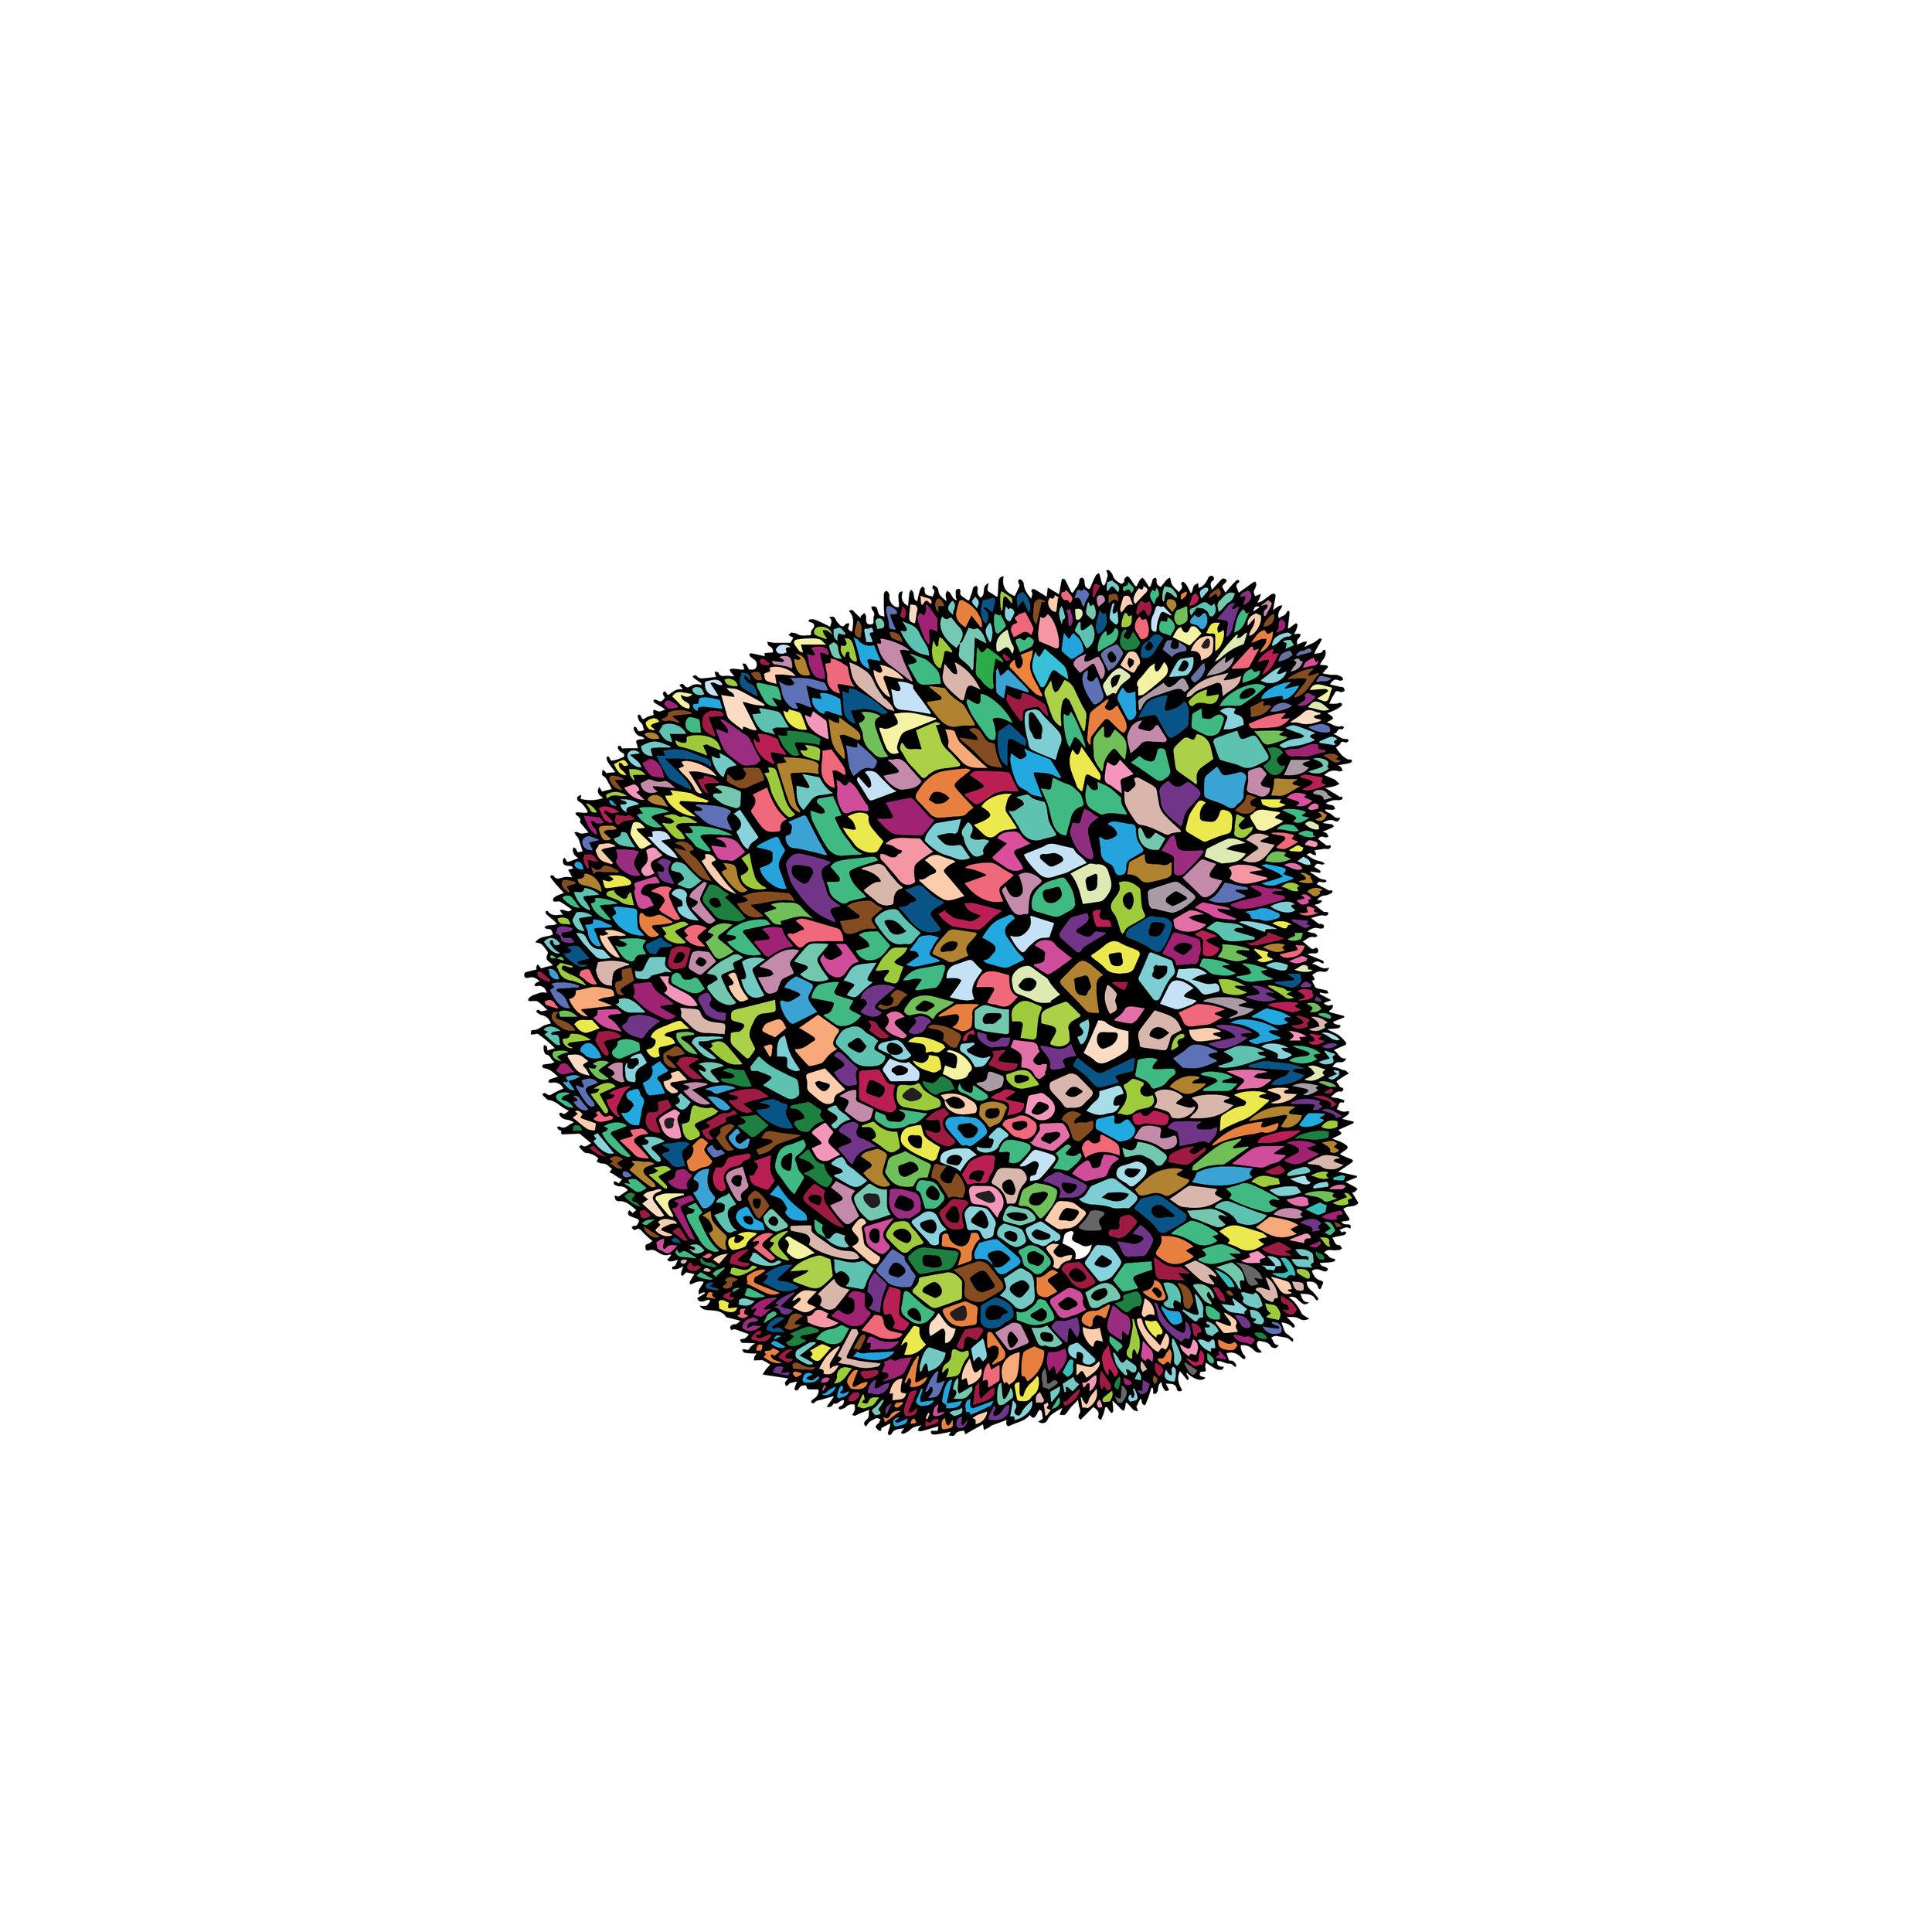 FrontCover_RGB (1).jpg